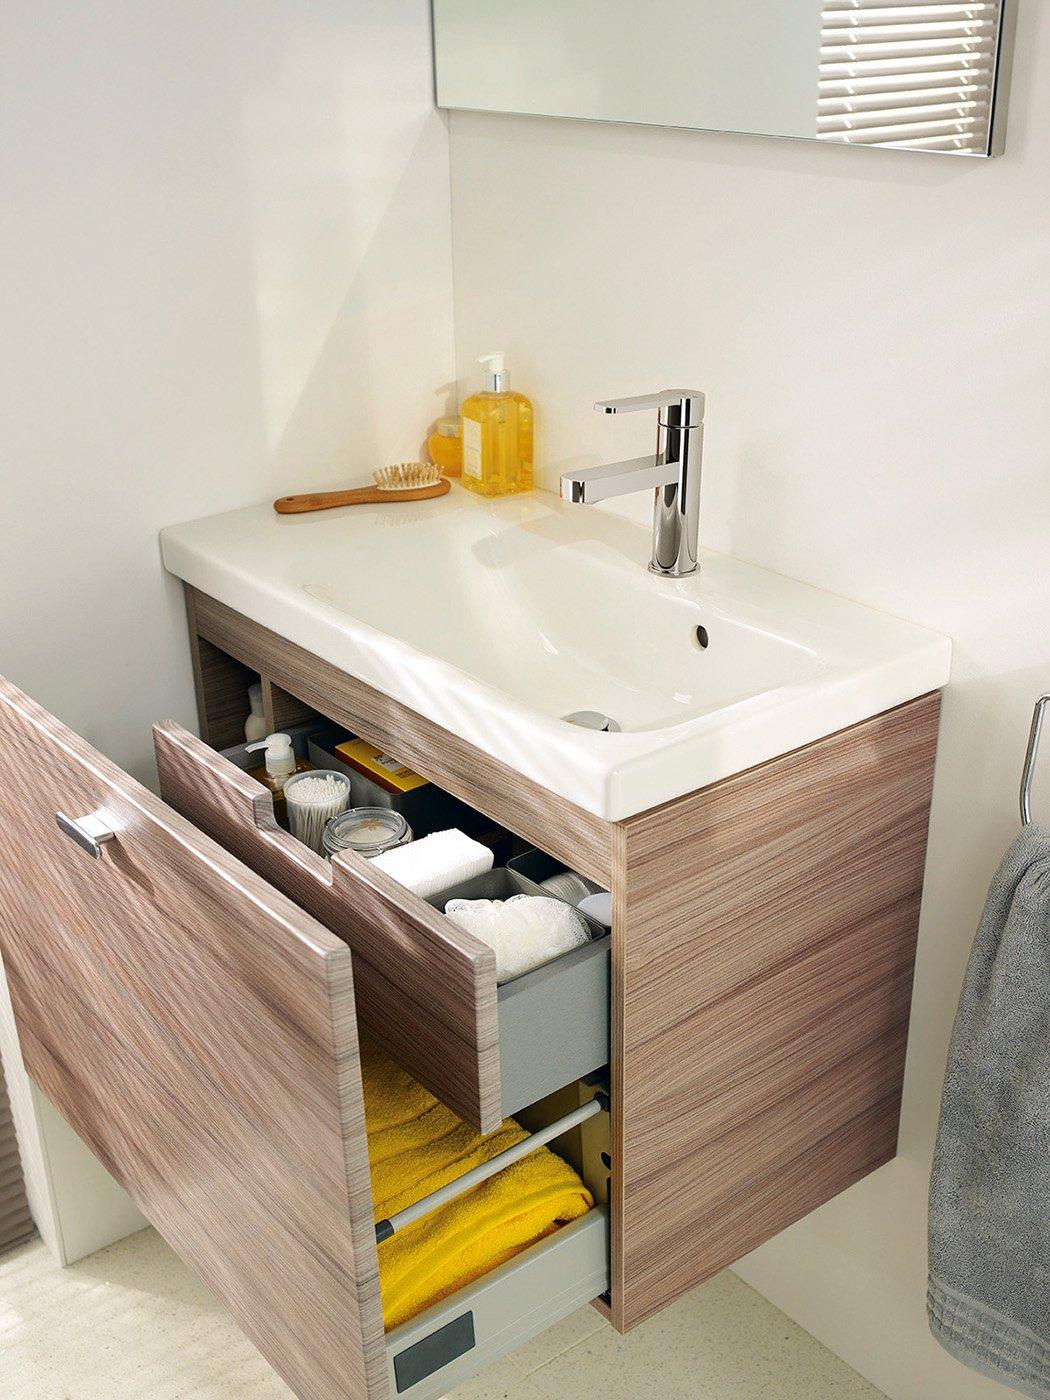 Mobiletto Bagno Sospeso Salvaspazio N45 Atlantic : Bagno mobile lavabo iniziale u mobili ue